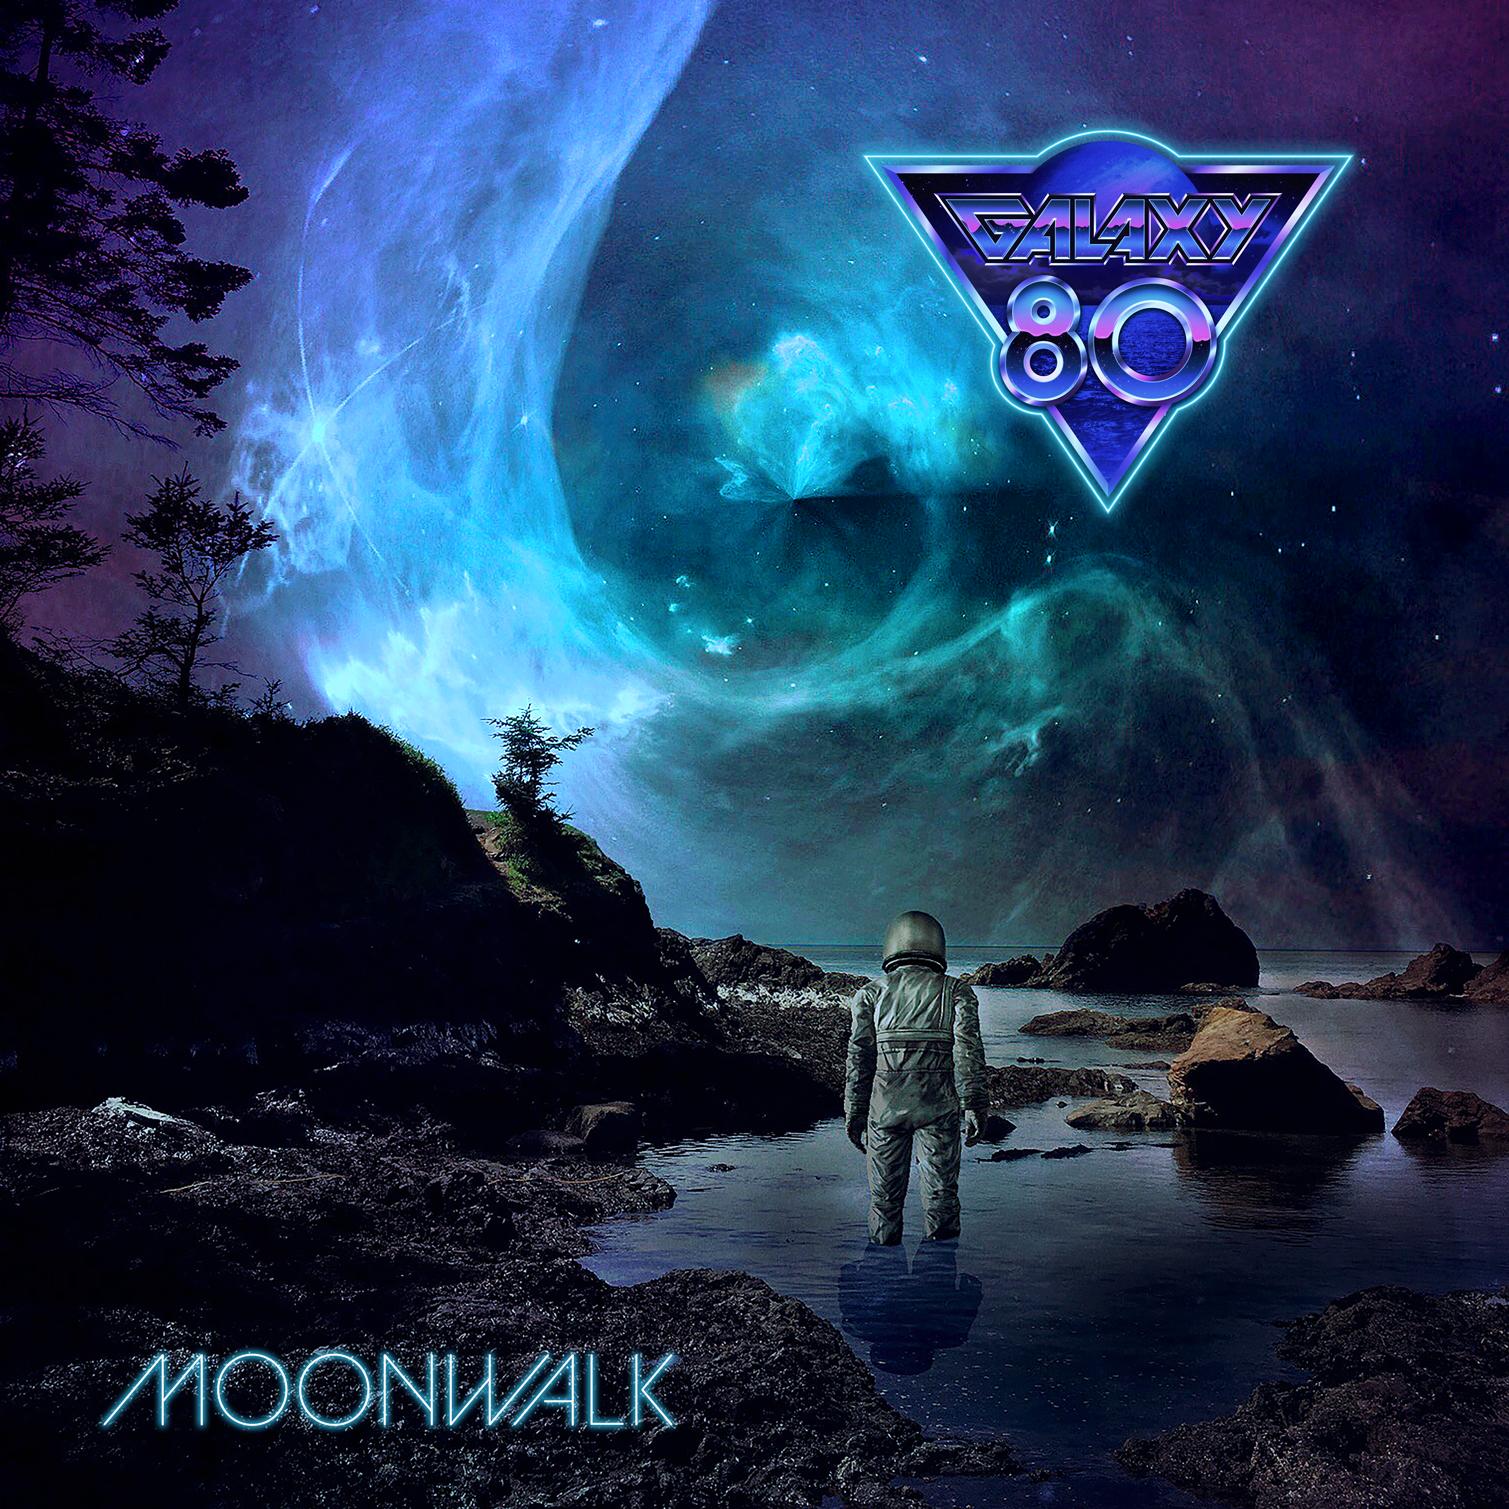 Galaxy80_Moonwalk_BandCampSquare.png